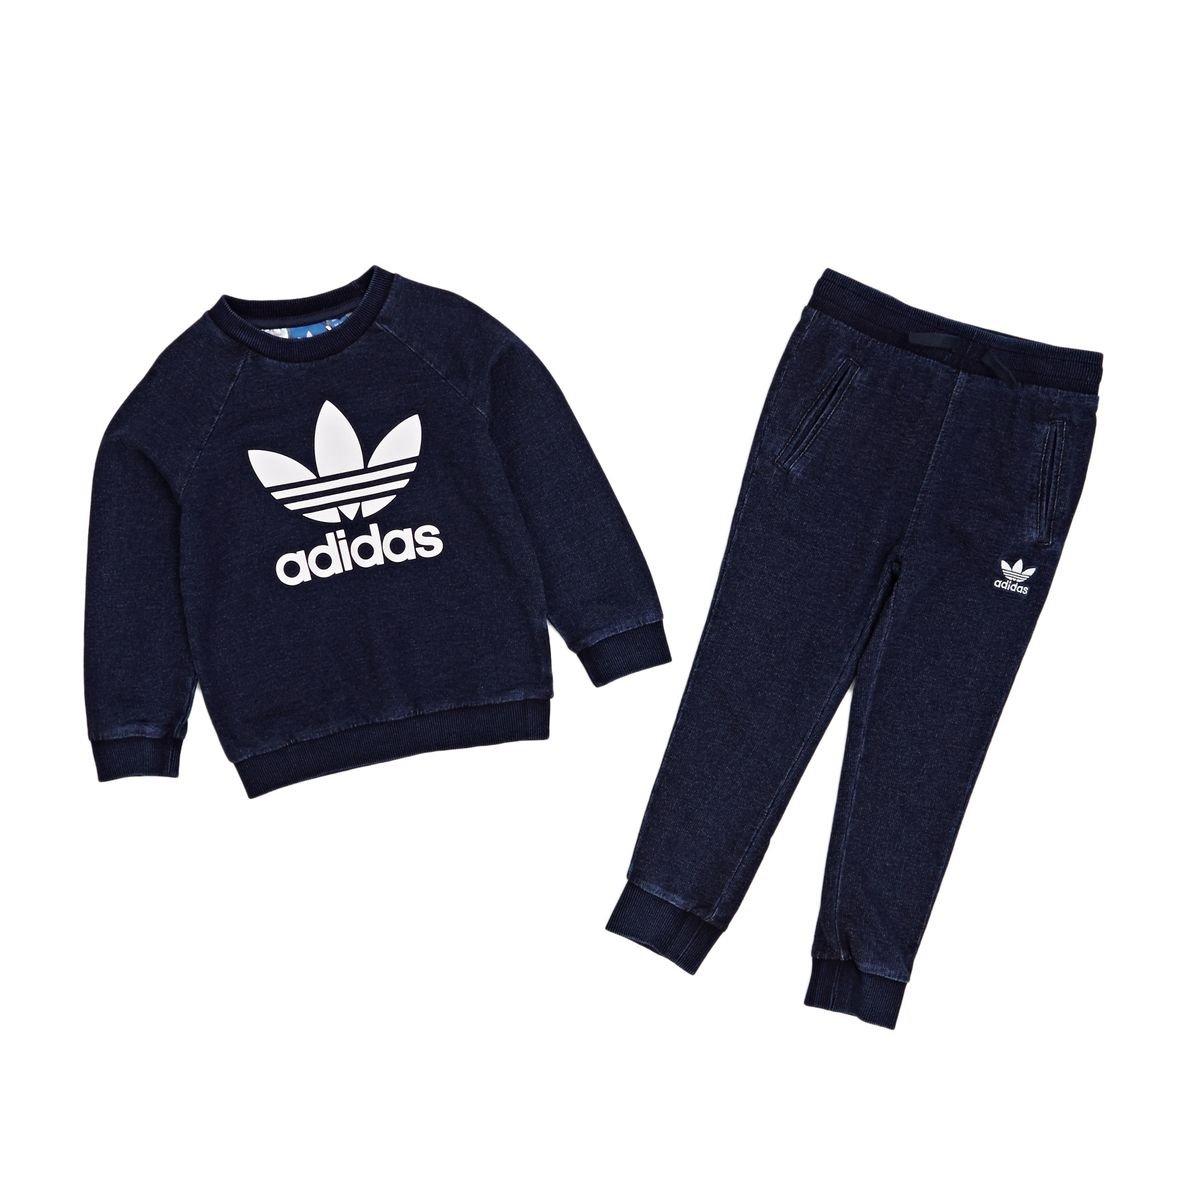 adidas Originals Boys Baby Boys Denim Crew Tracksuit in Navy - 9-12m S95948